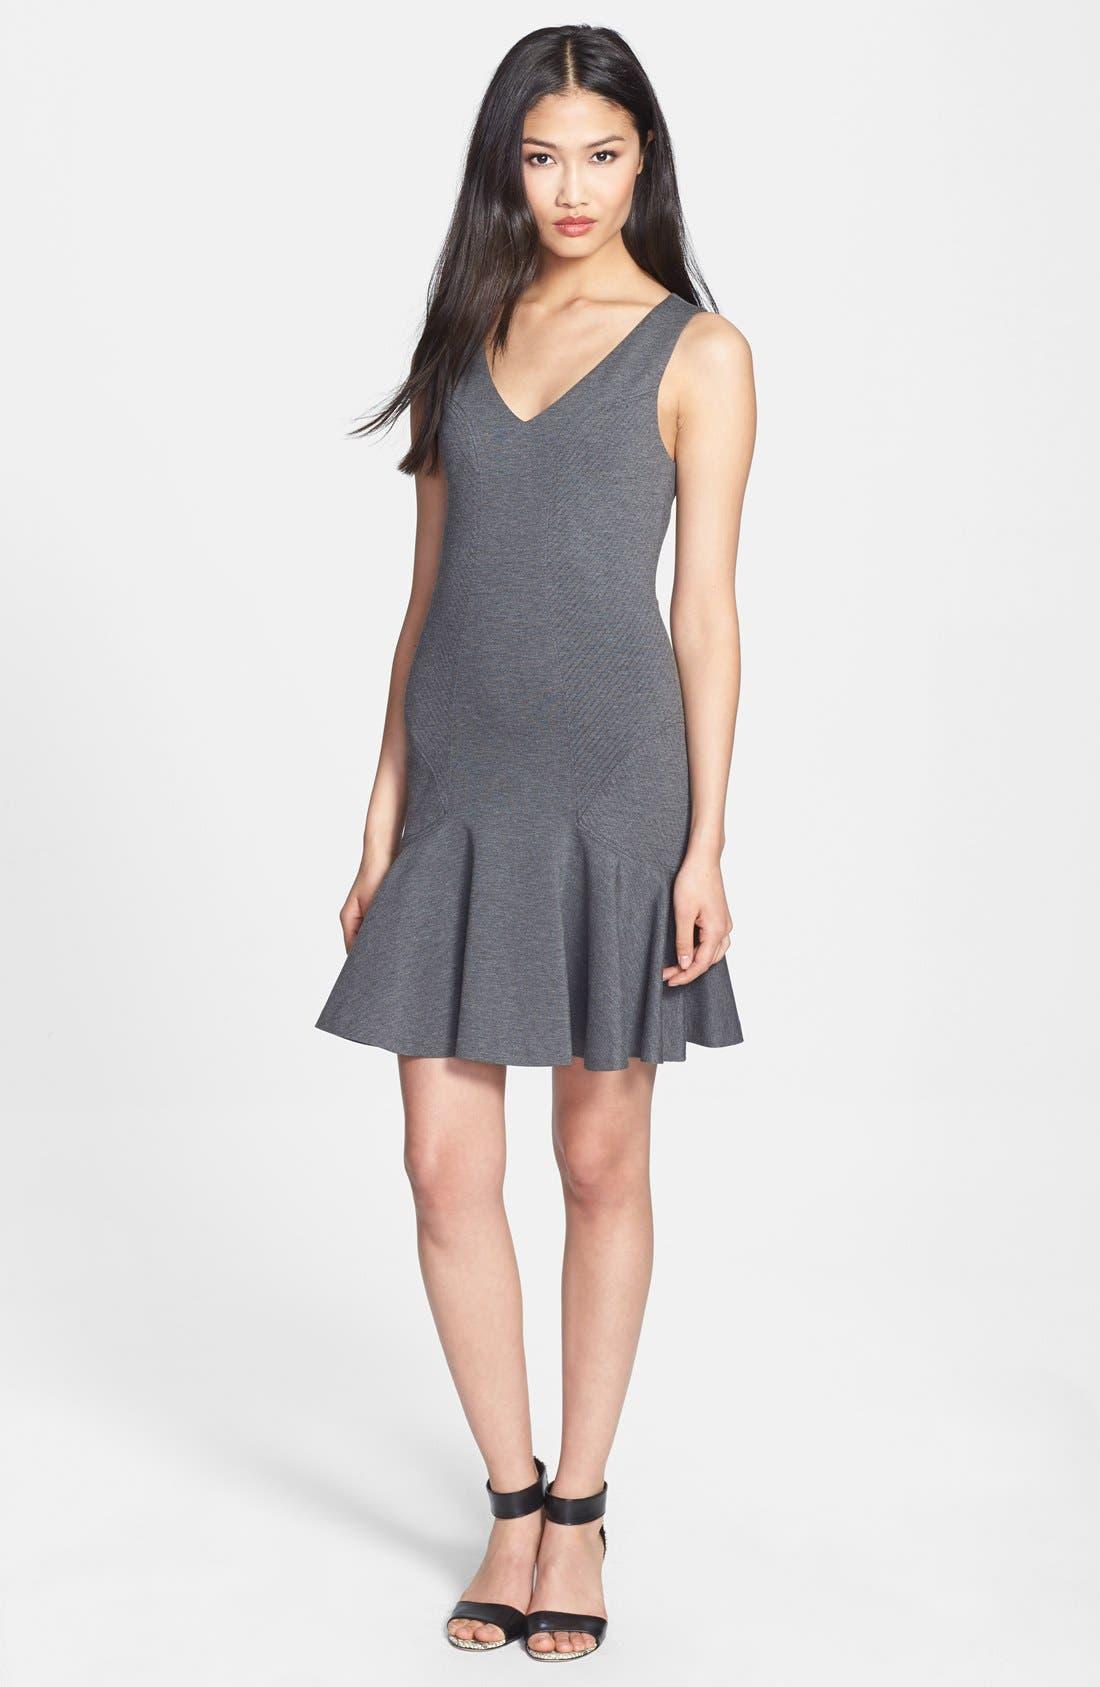 Main Image - Diane von Furstenberg 'Carla' Knit Sheath Dress